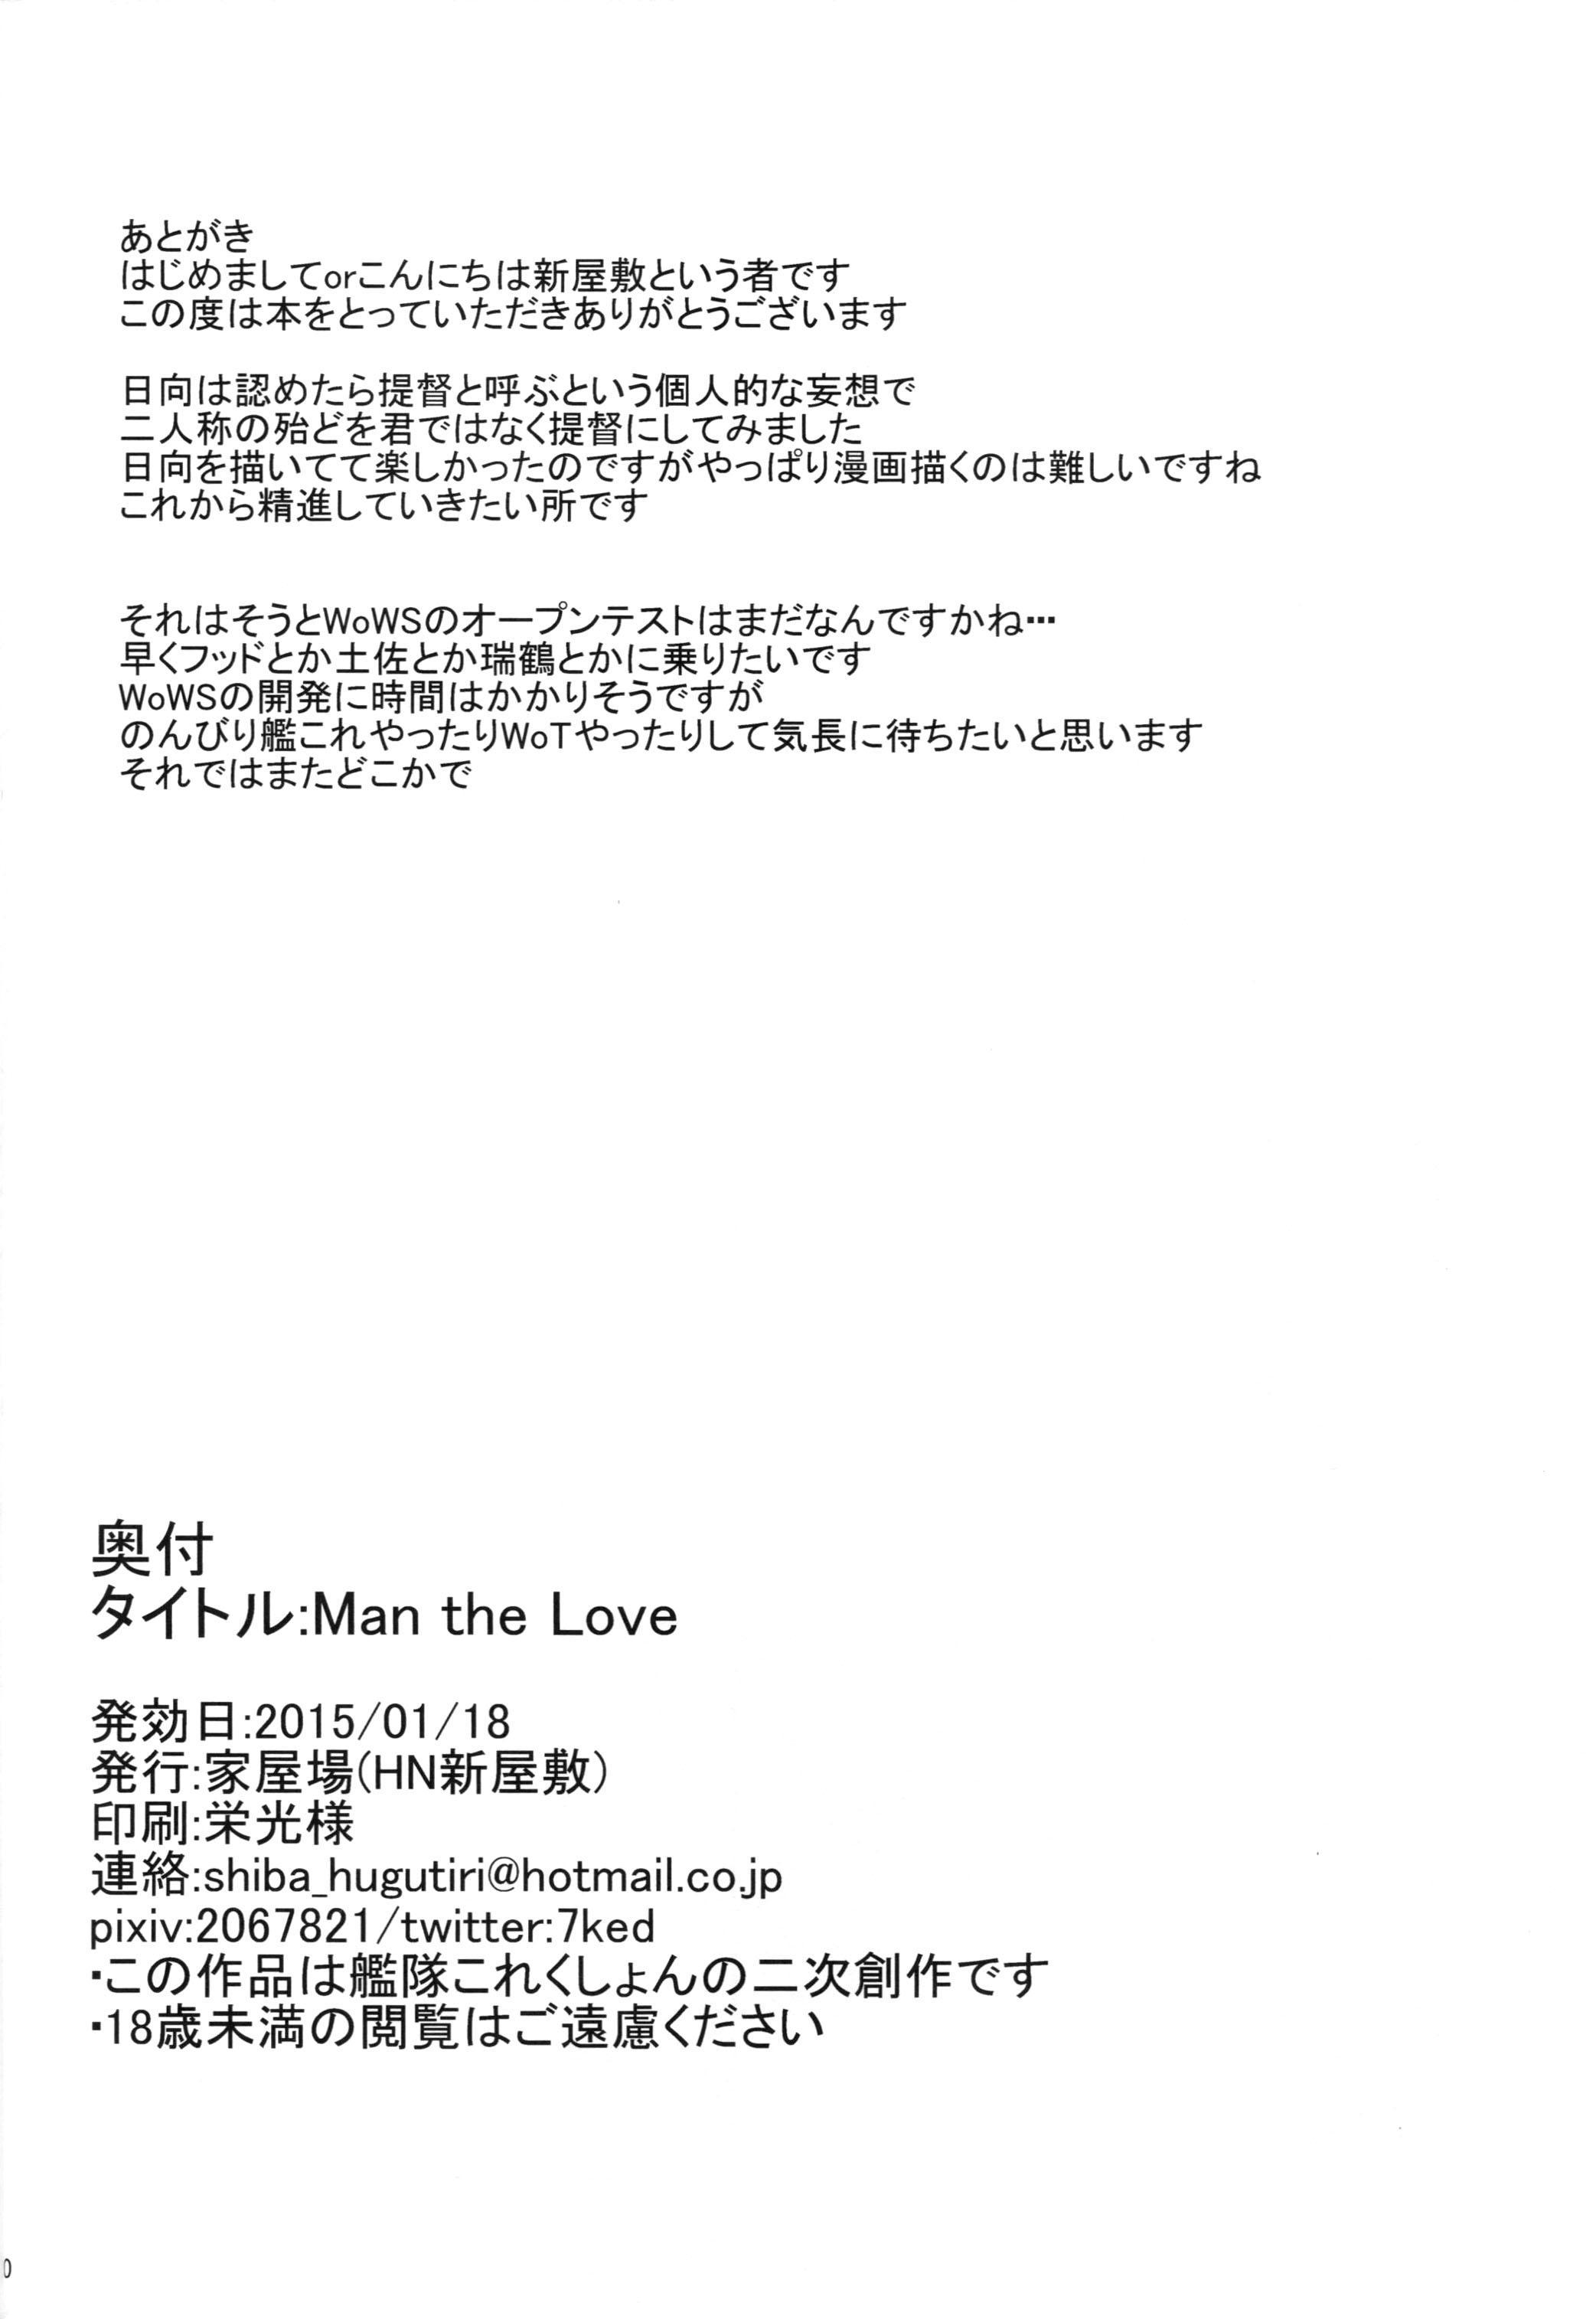 Man the Love 20